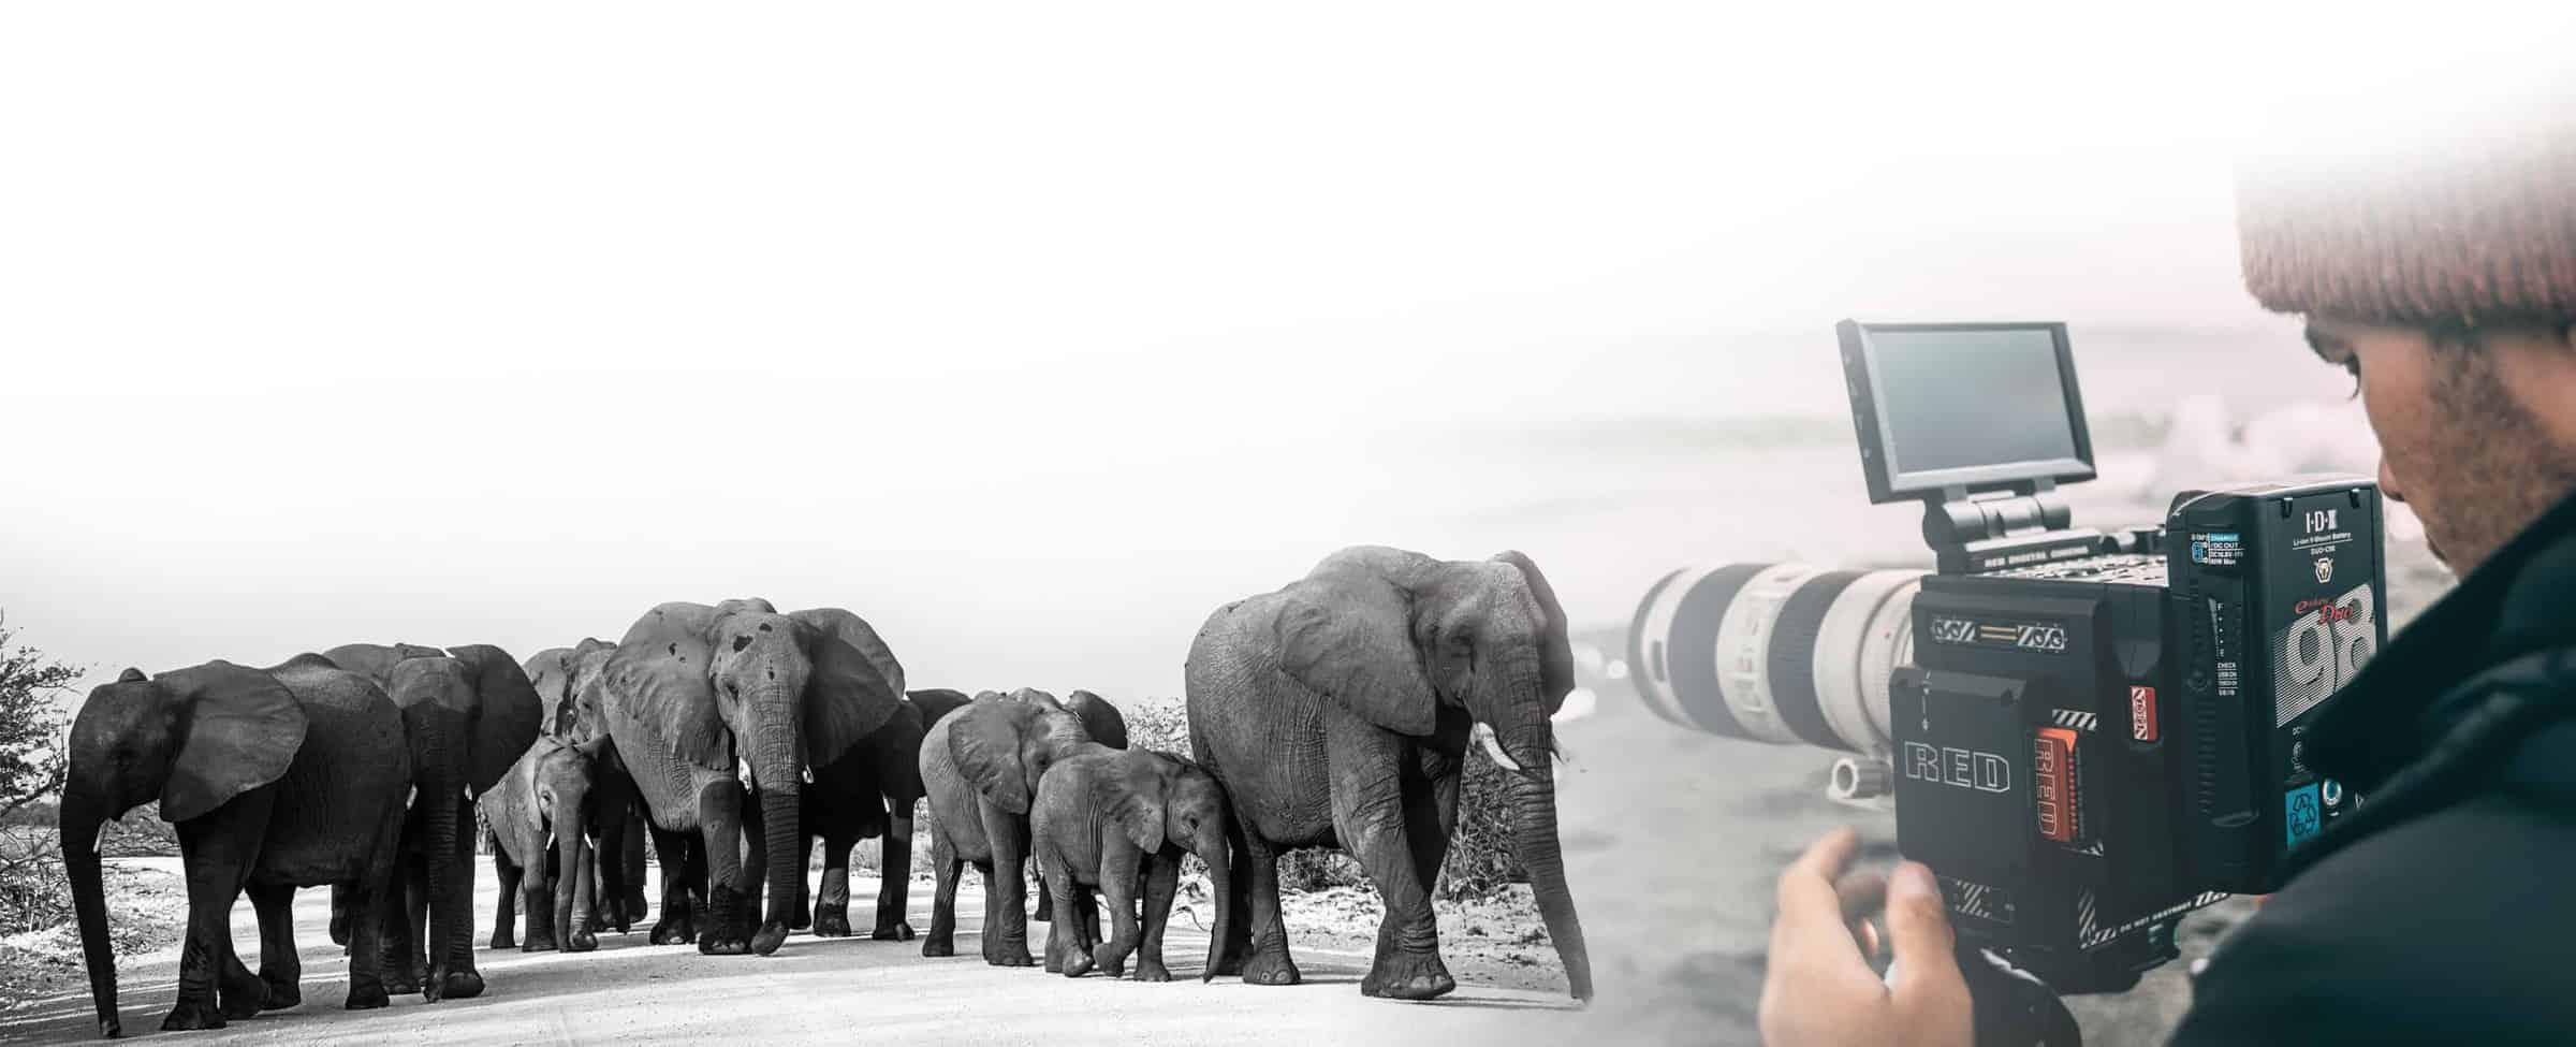 Photo Elephant Namibie Animaliere Jcpieri